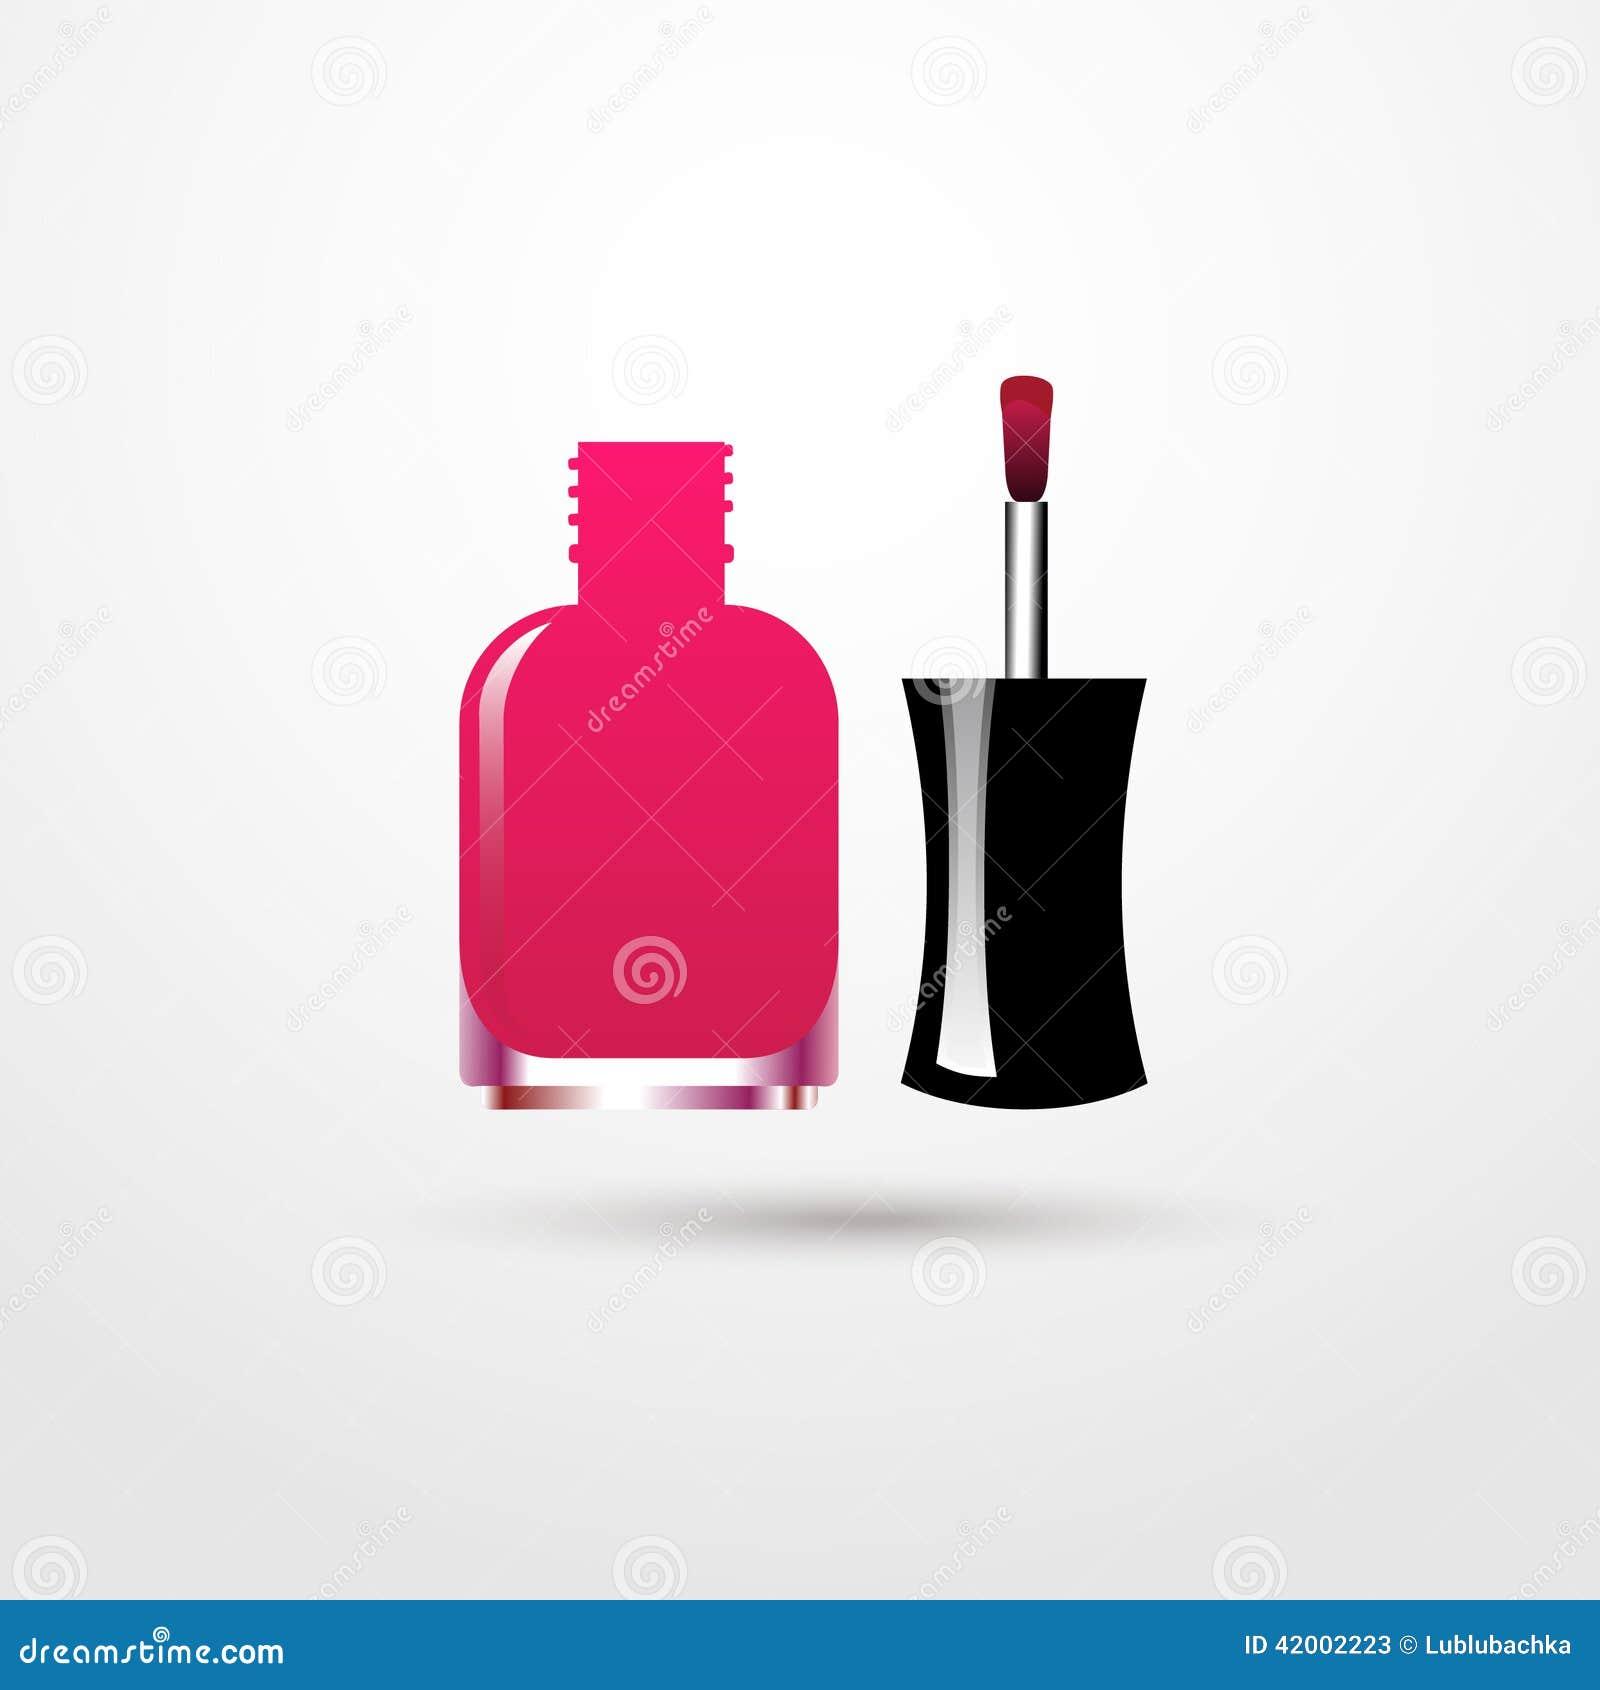 Pink Nail Polish Open Bottle Isolated On White Background Stock Vector Illustration Of Girly